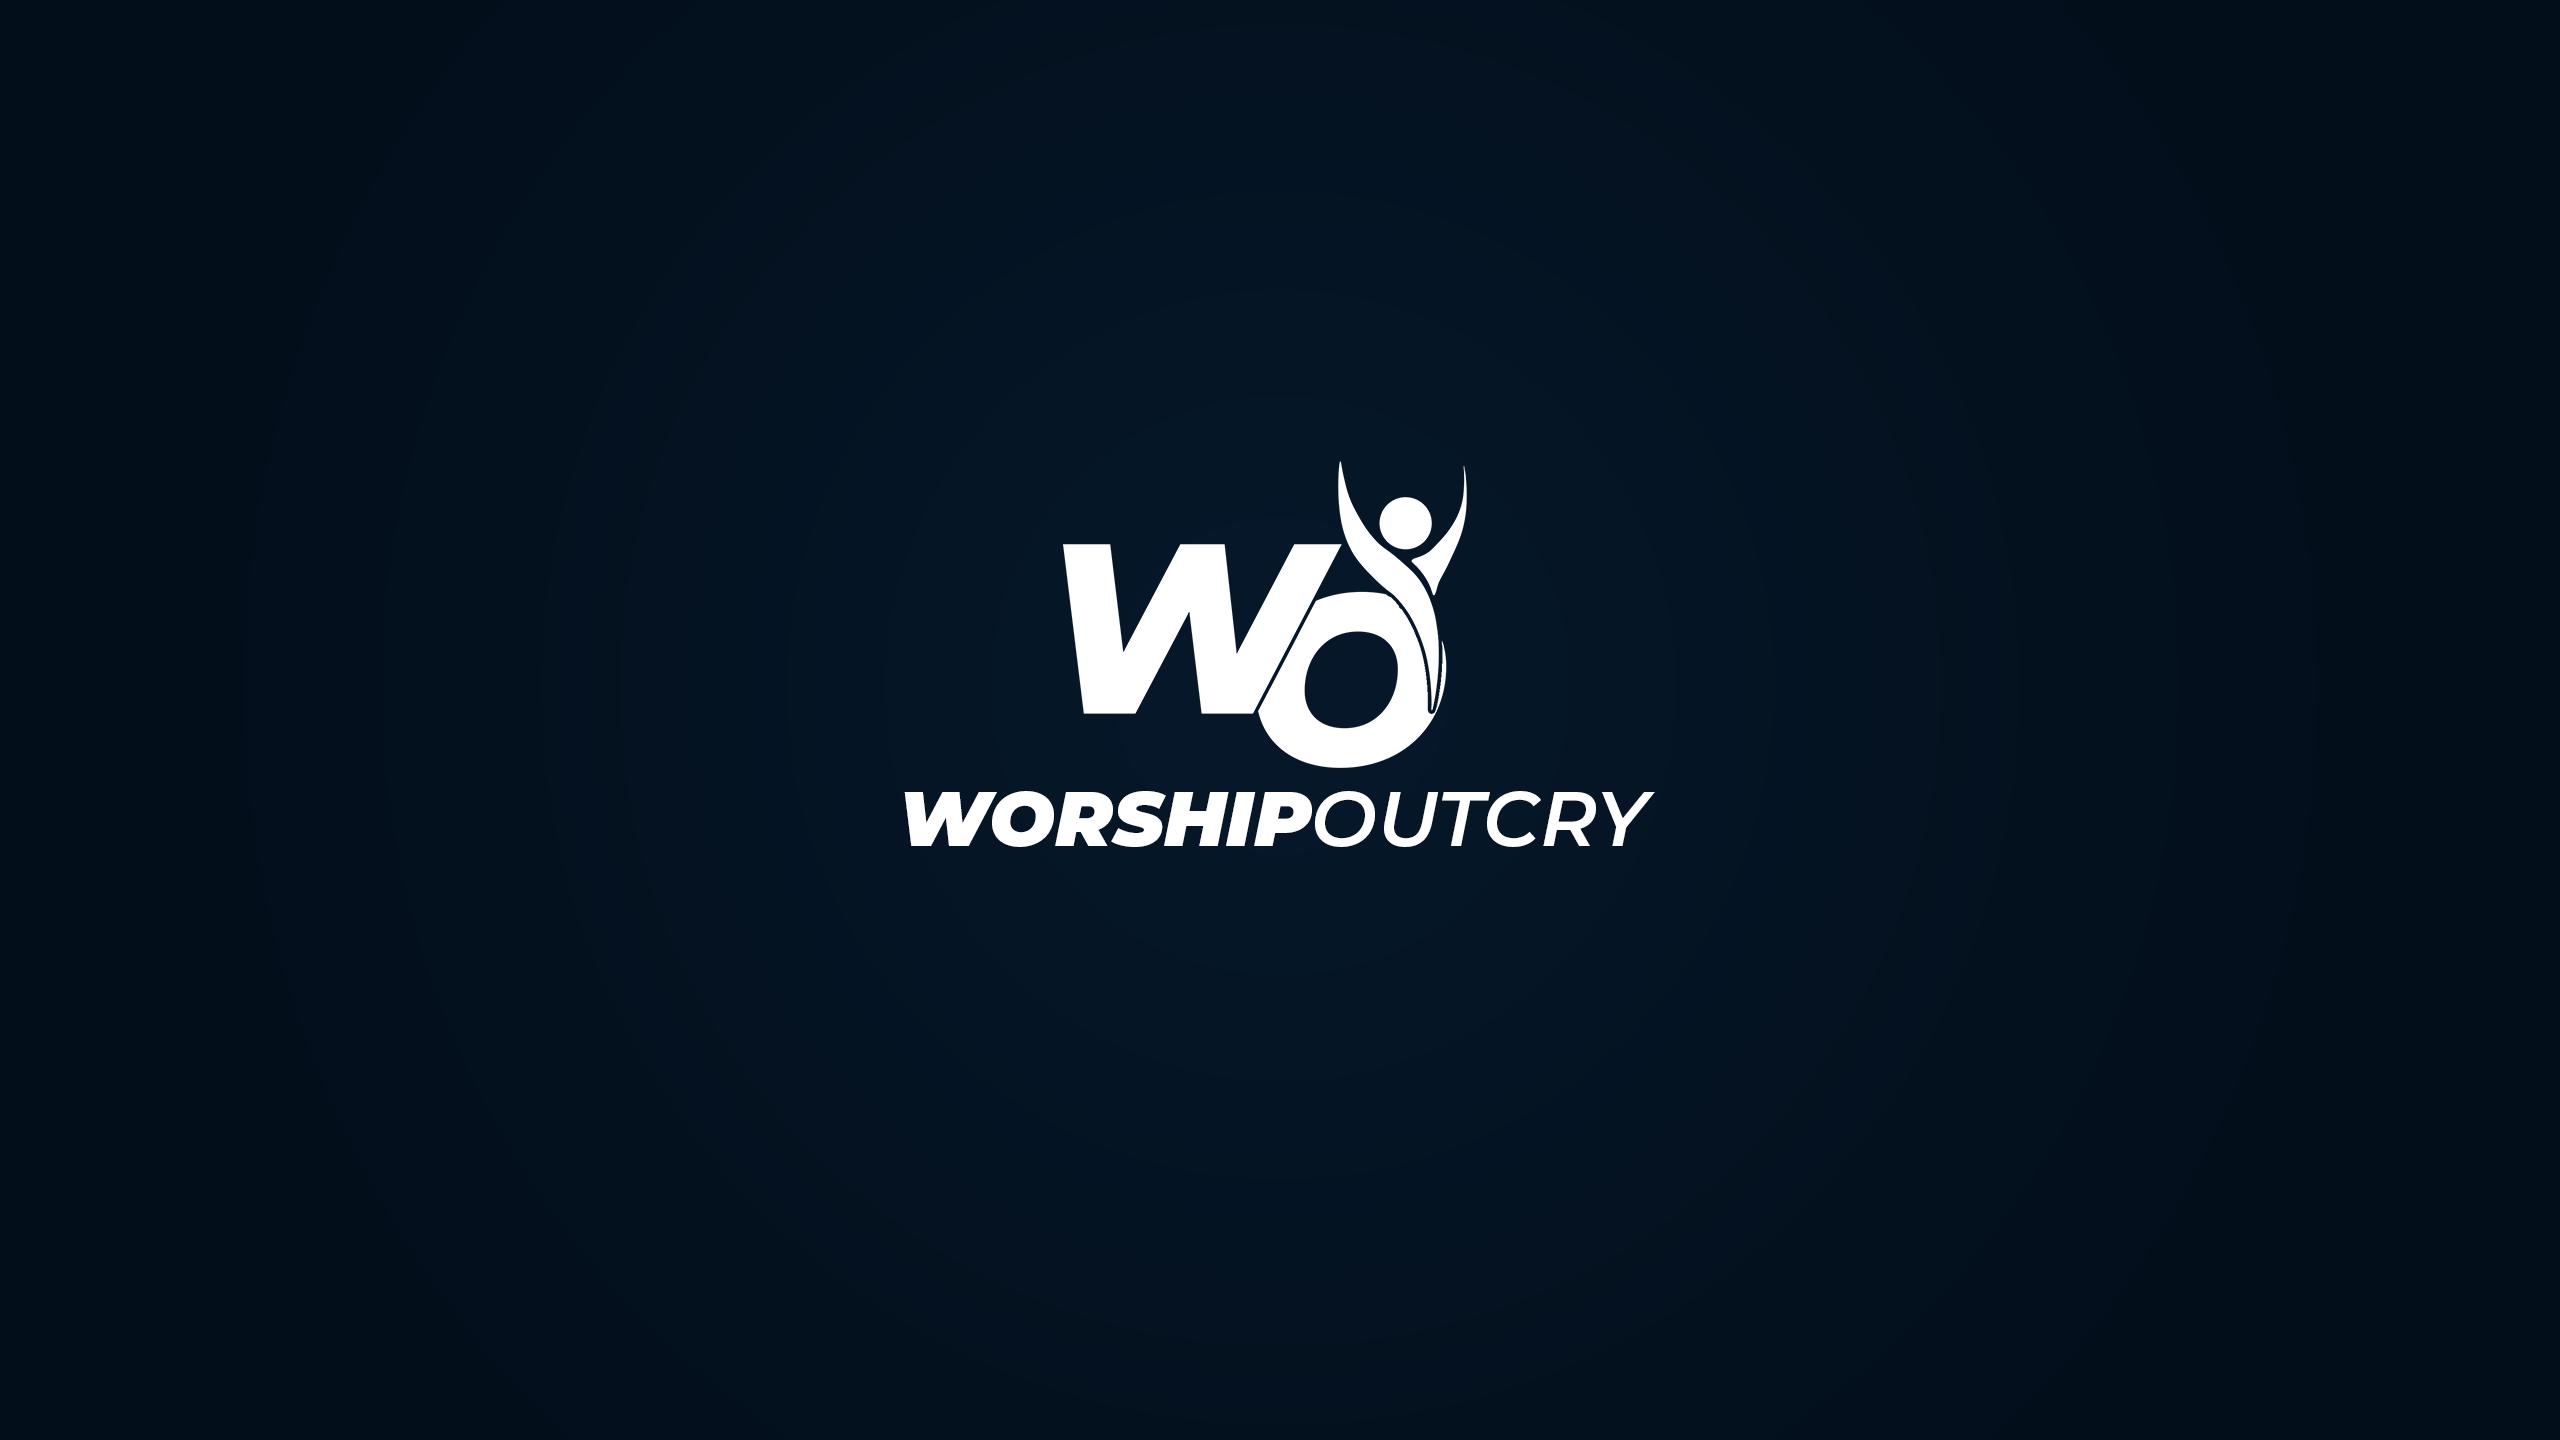 Worship Outcry